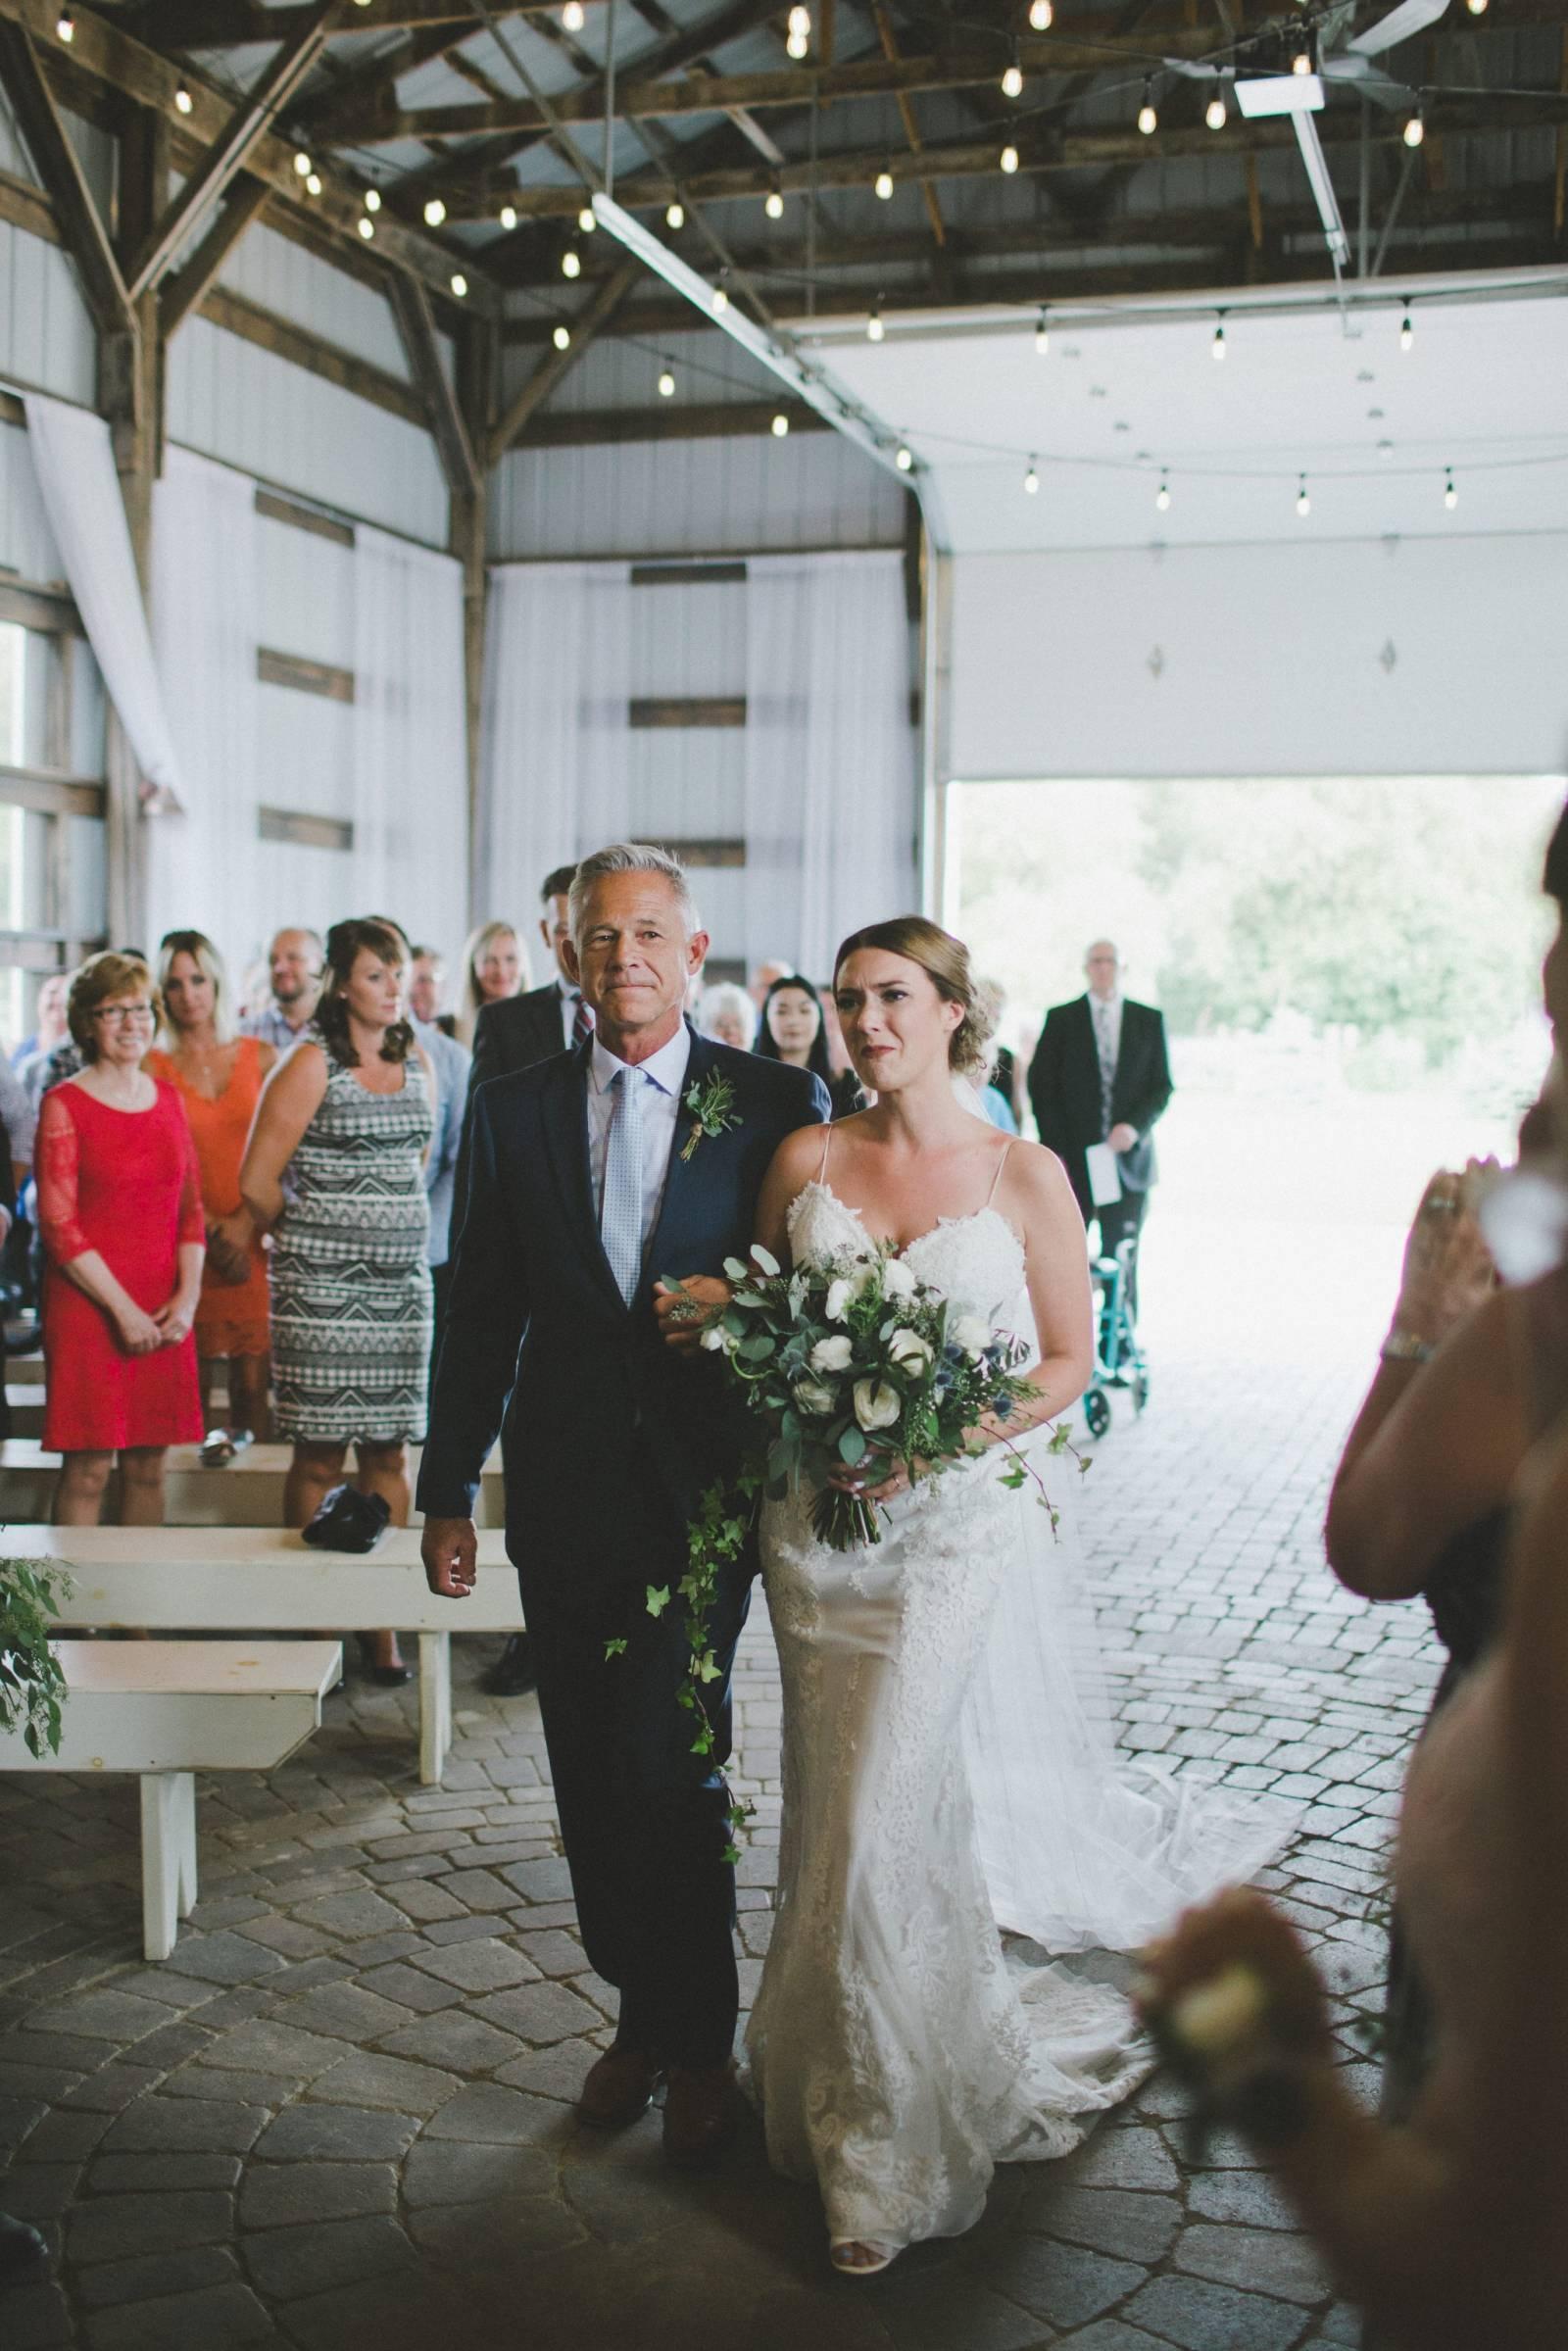 The Rustic Wedding – Part I The Rustic Wedding – Part I new images